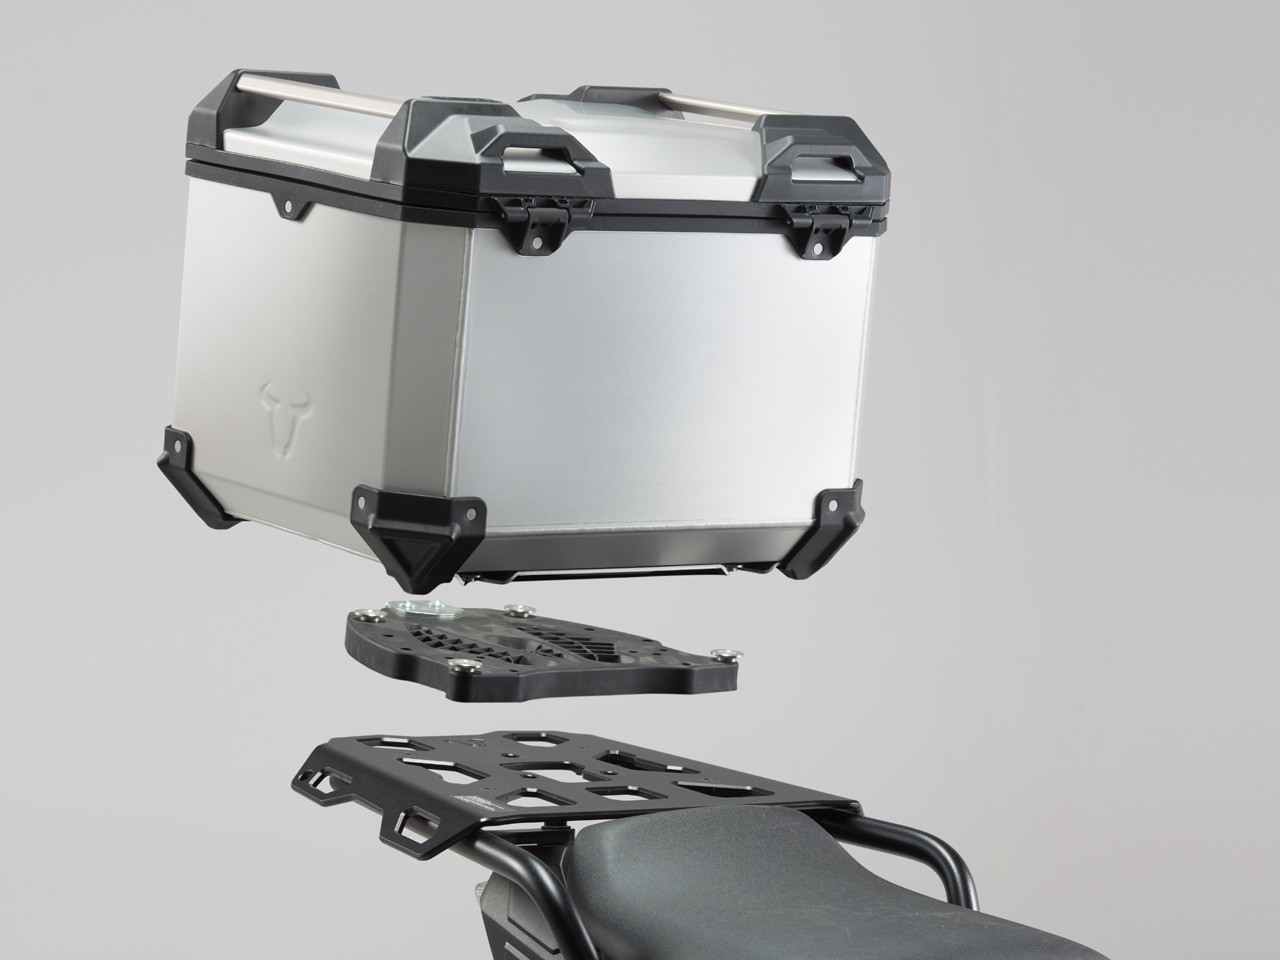 Honda CRF 1000 L Africa Twin (15-17) - sada horního nosiče s kuf